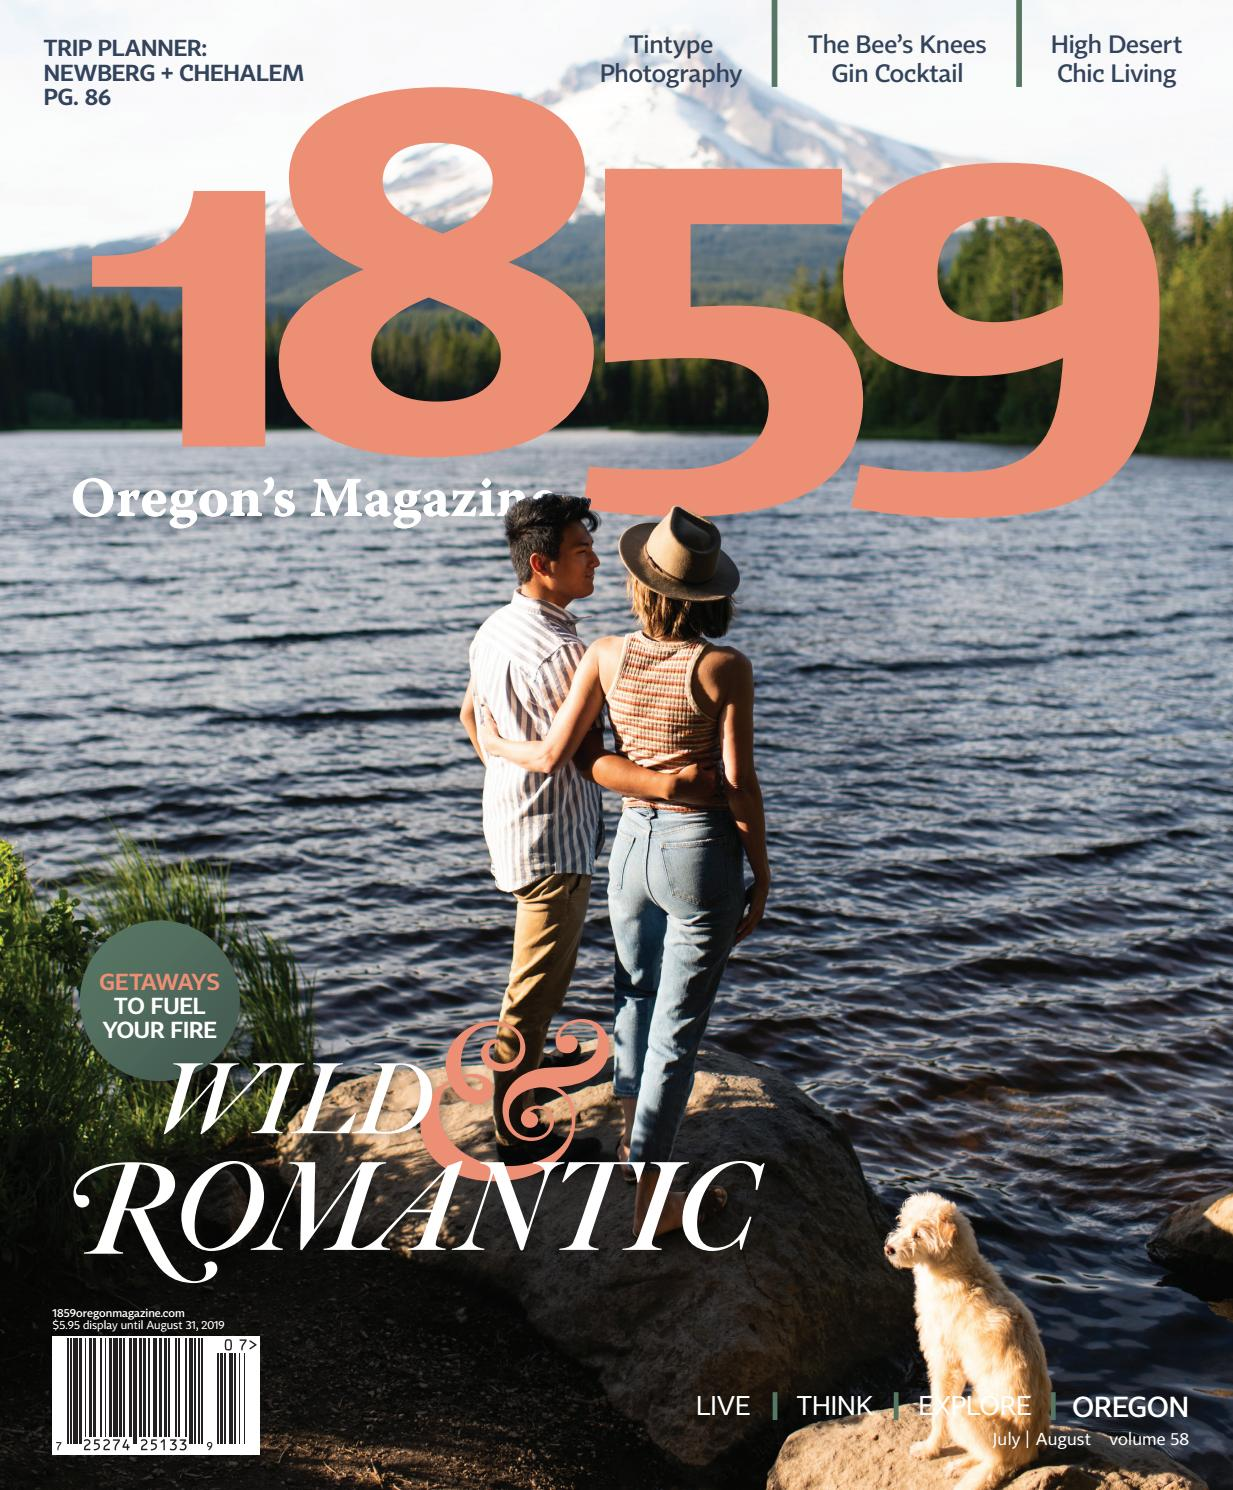 1859 Oregon's Magazine | July/August 2019 by Statehood Media - issuu